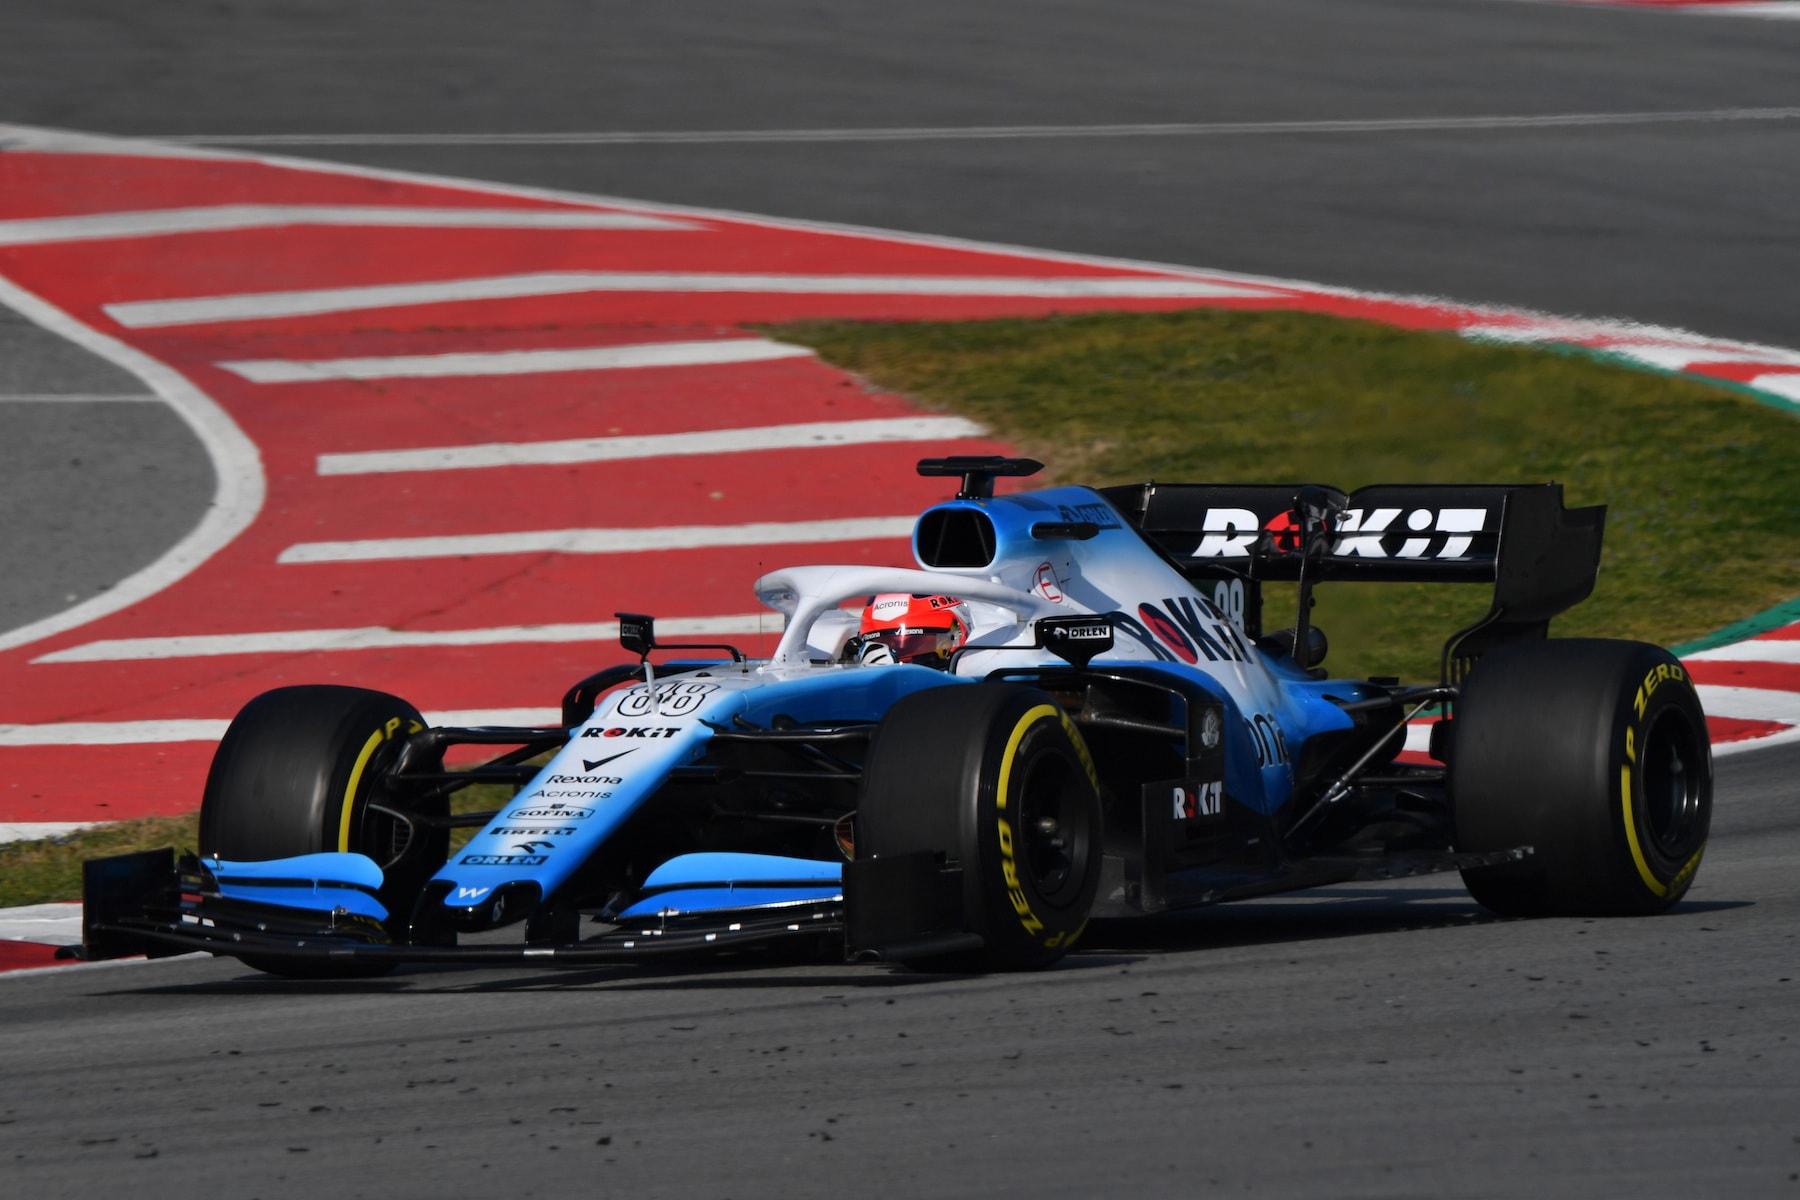 2019 Robert Kubica   Williams FW42   2019 Barcelona T1 D4 2 copy.jpg